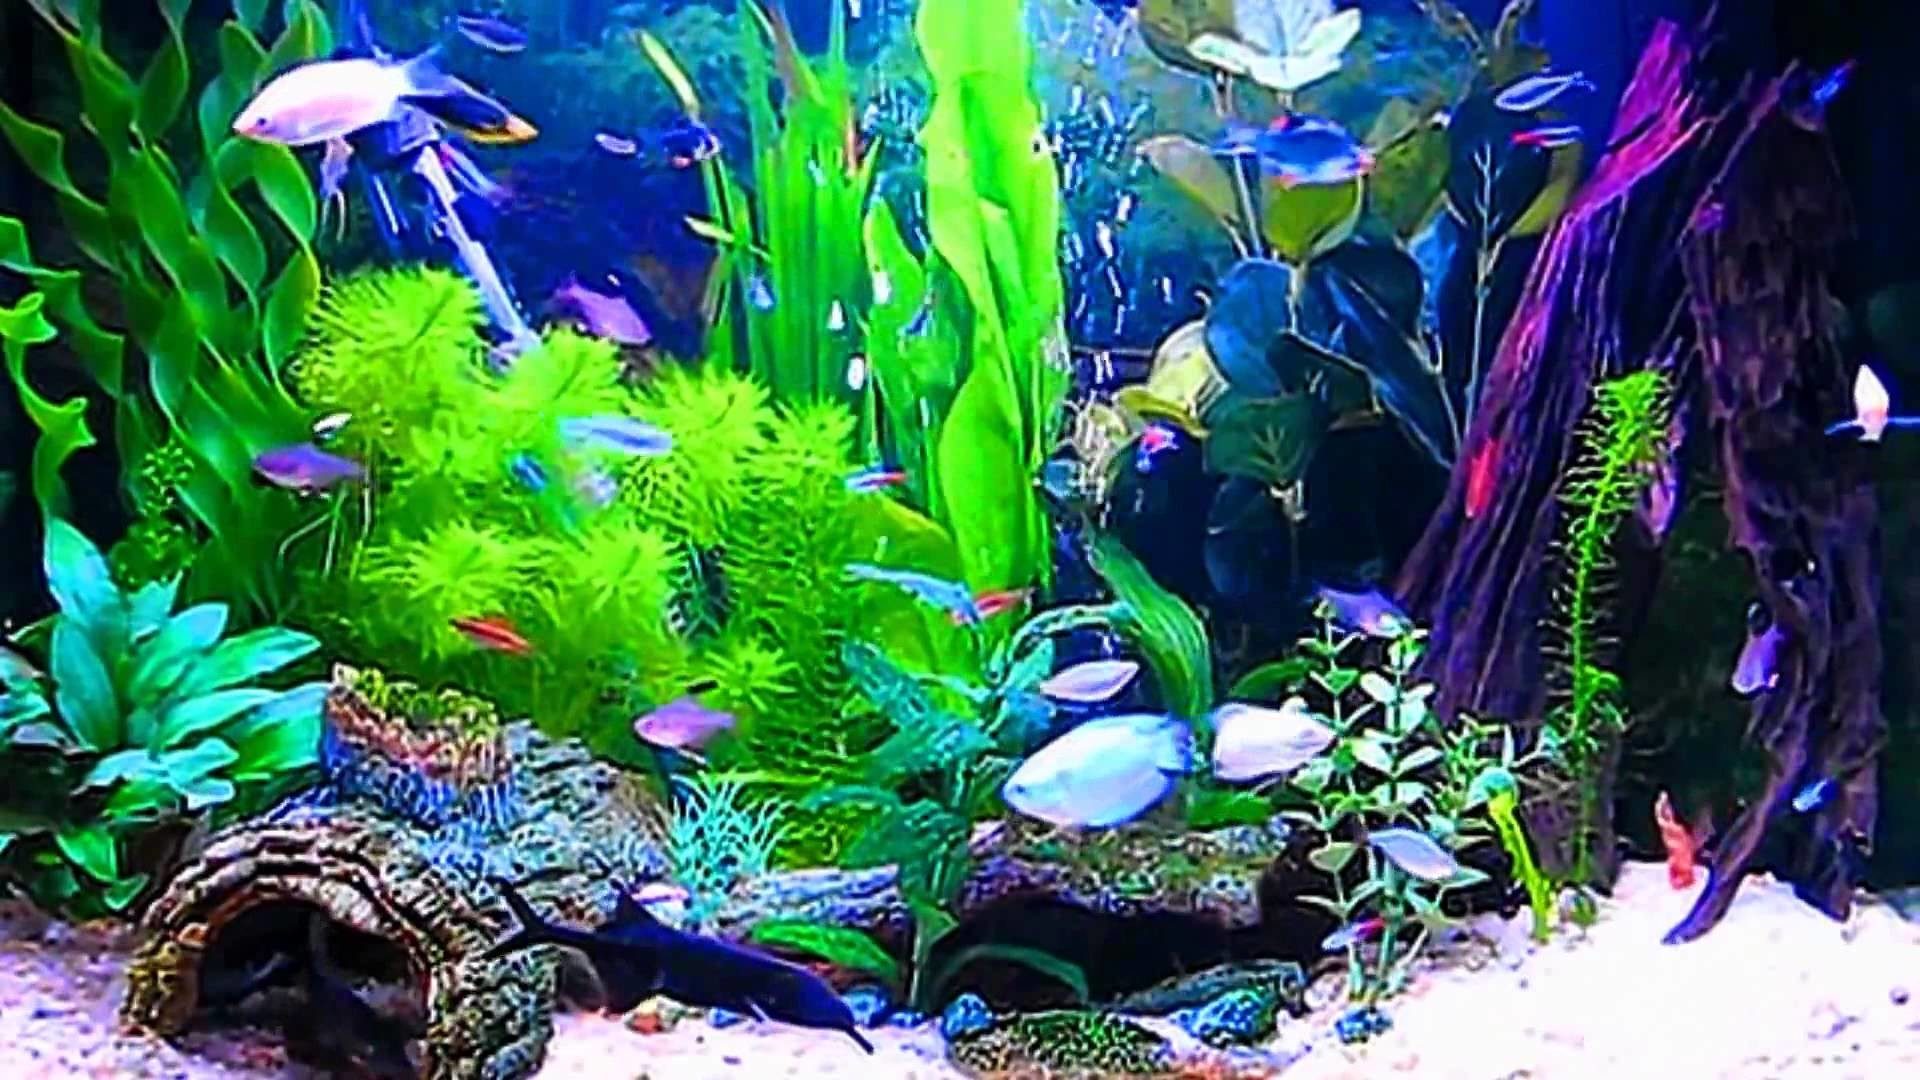 HD Aquarium ScreenSaver Free Windows and Android Full HD – YouTube .